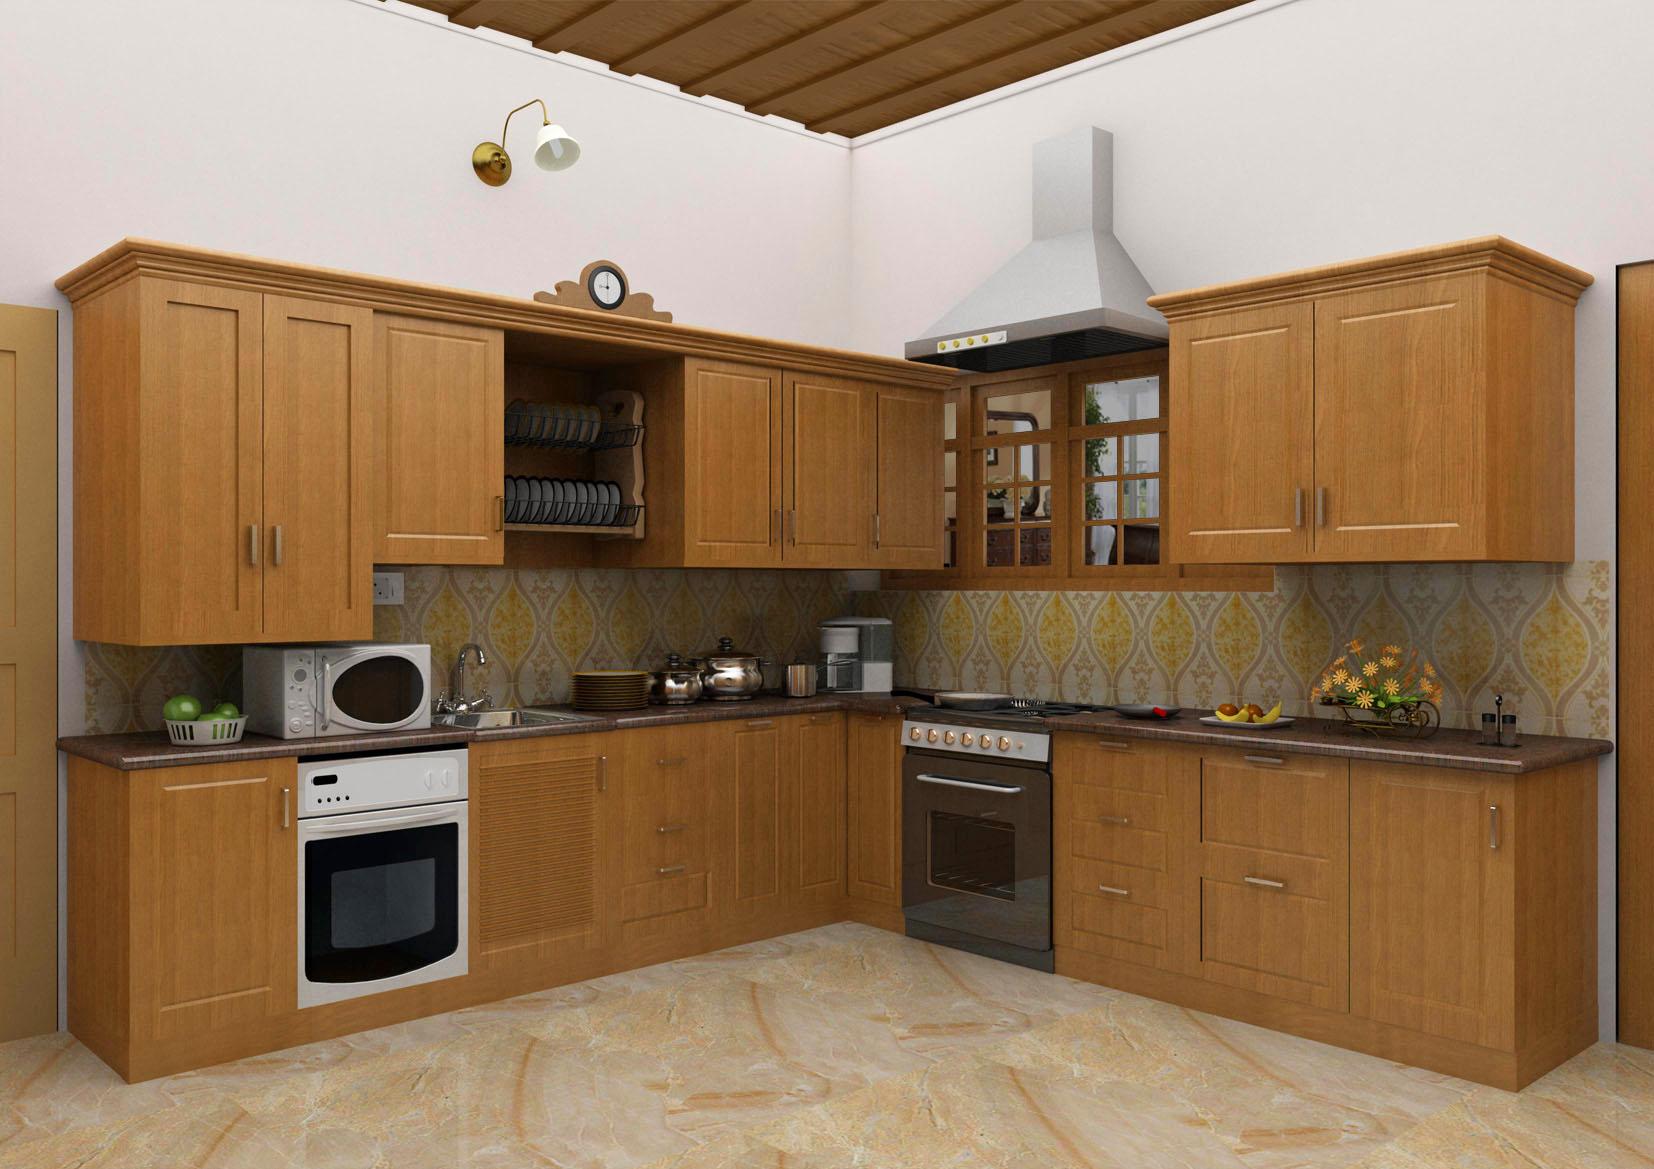 Auto Fresh Modular Kitchen